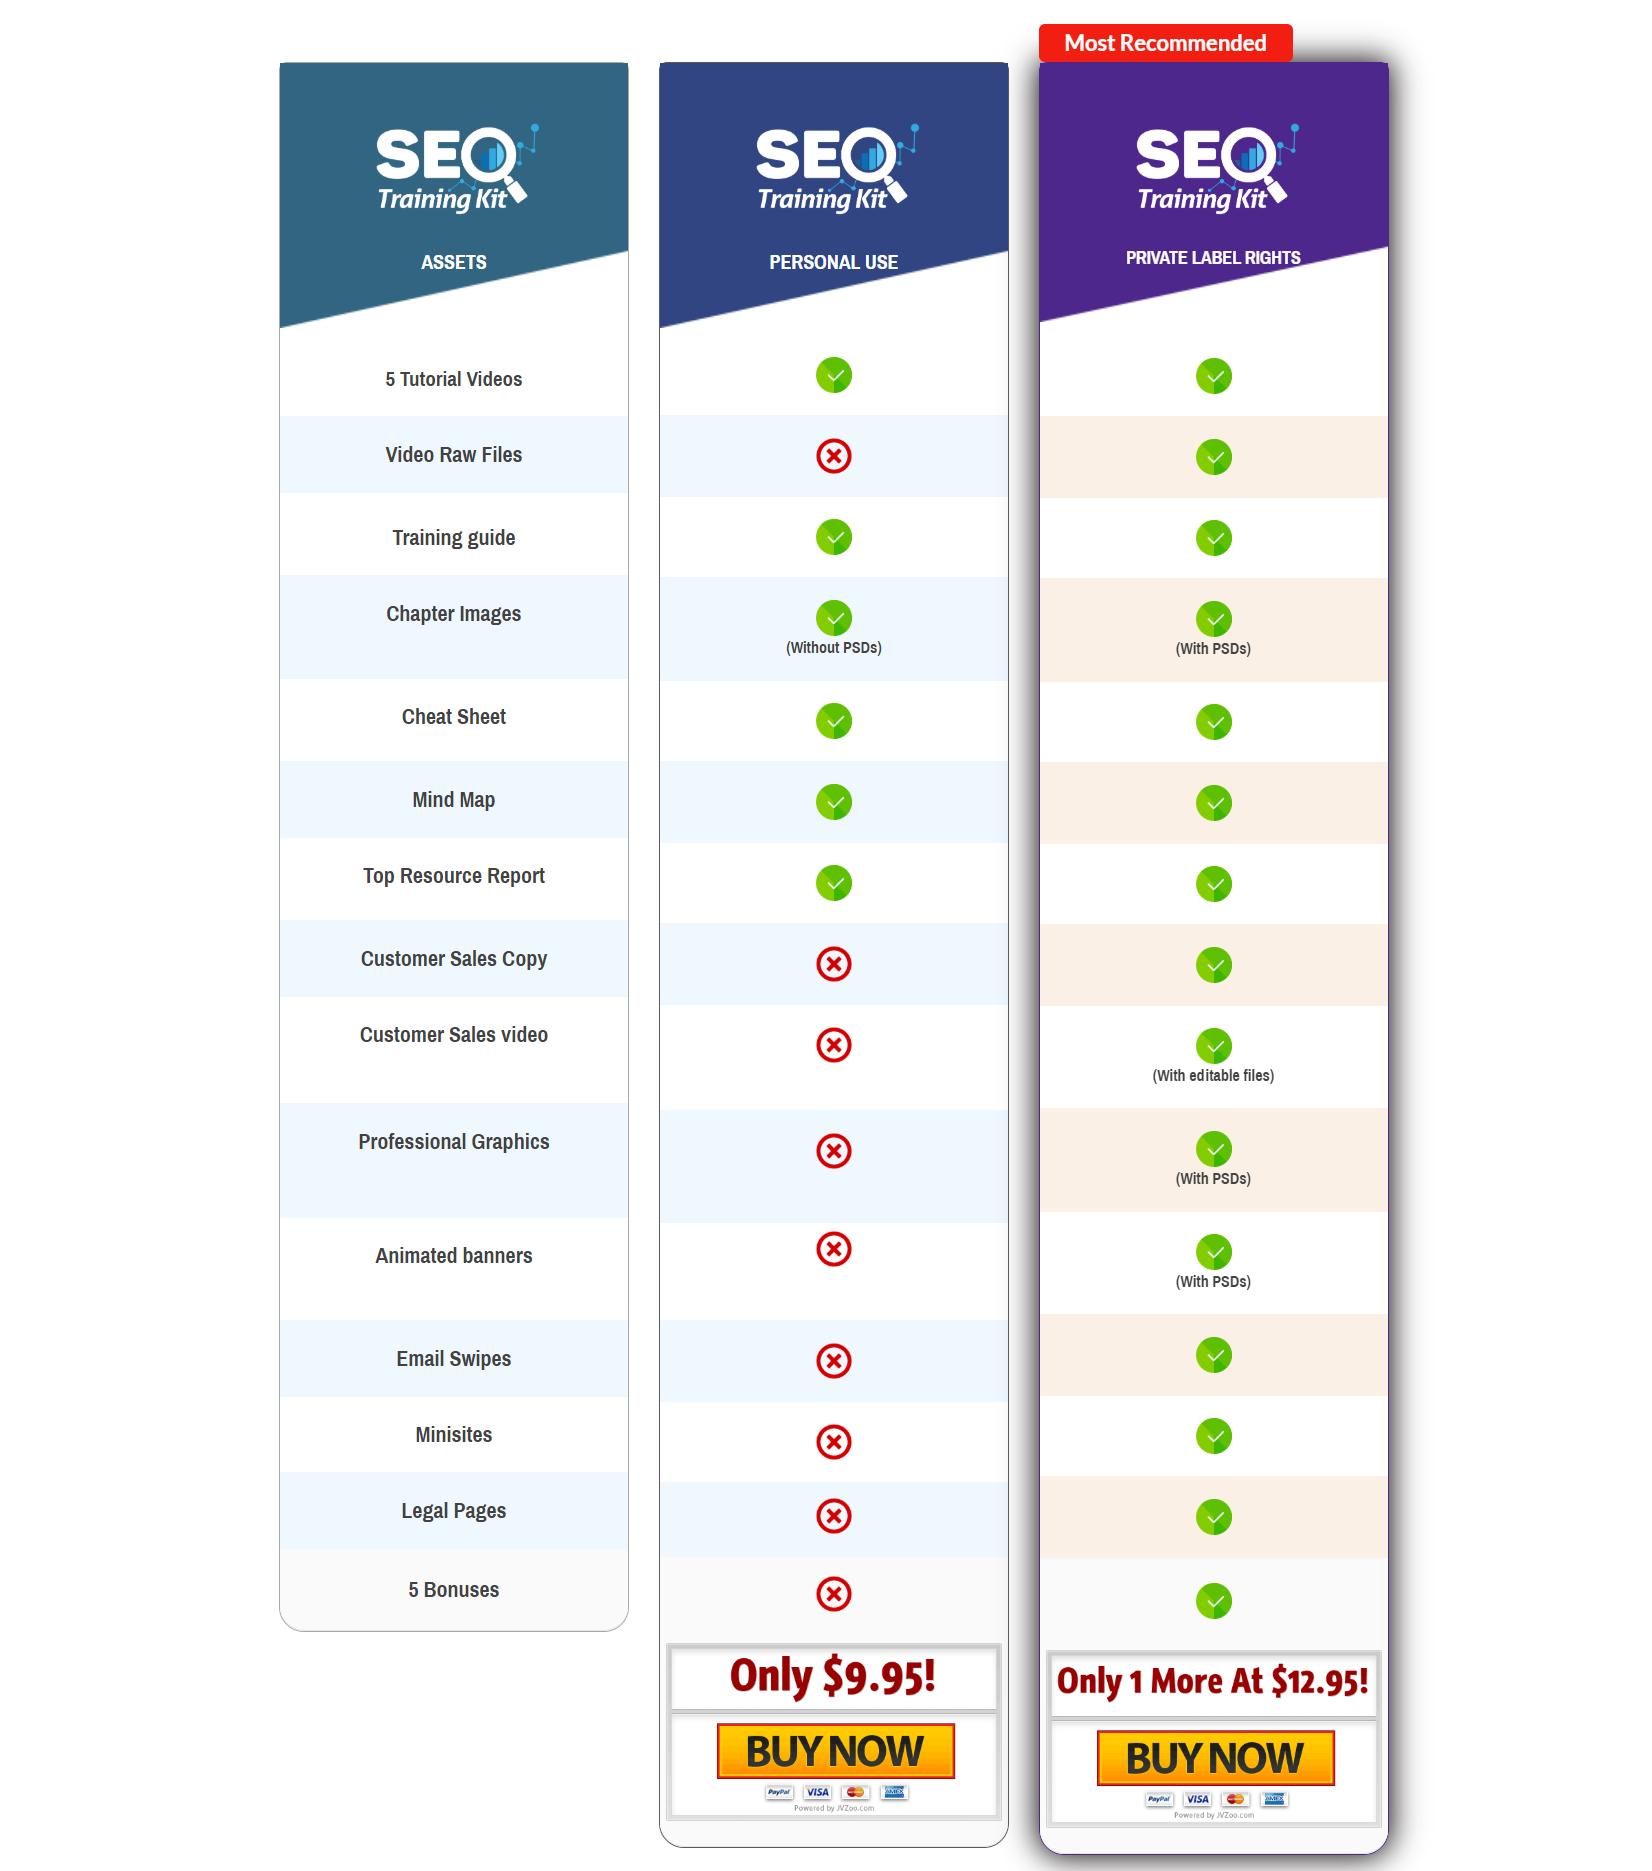 SEO-Training-Kit-Price